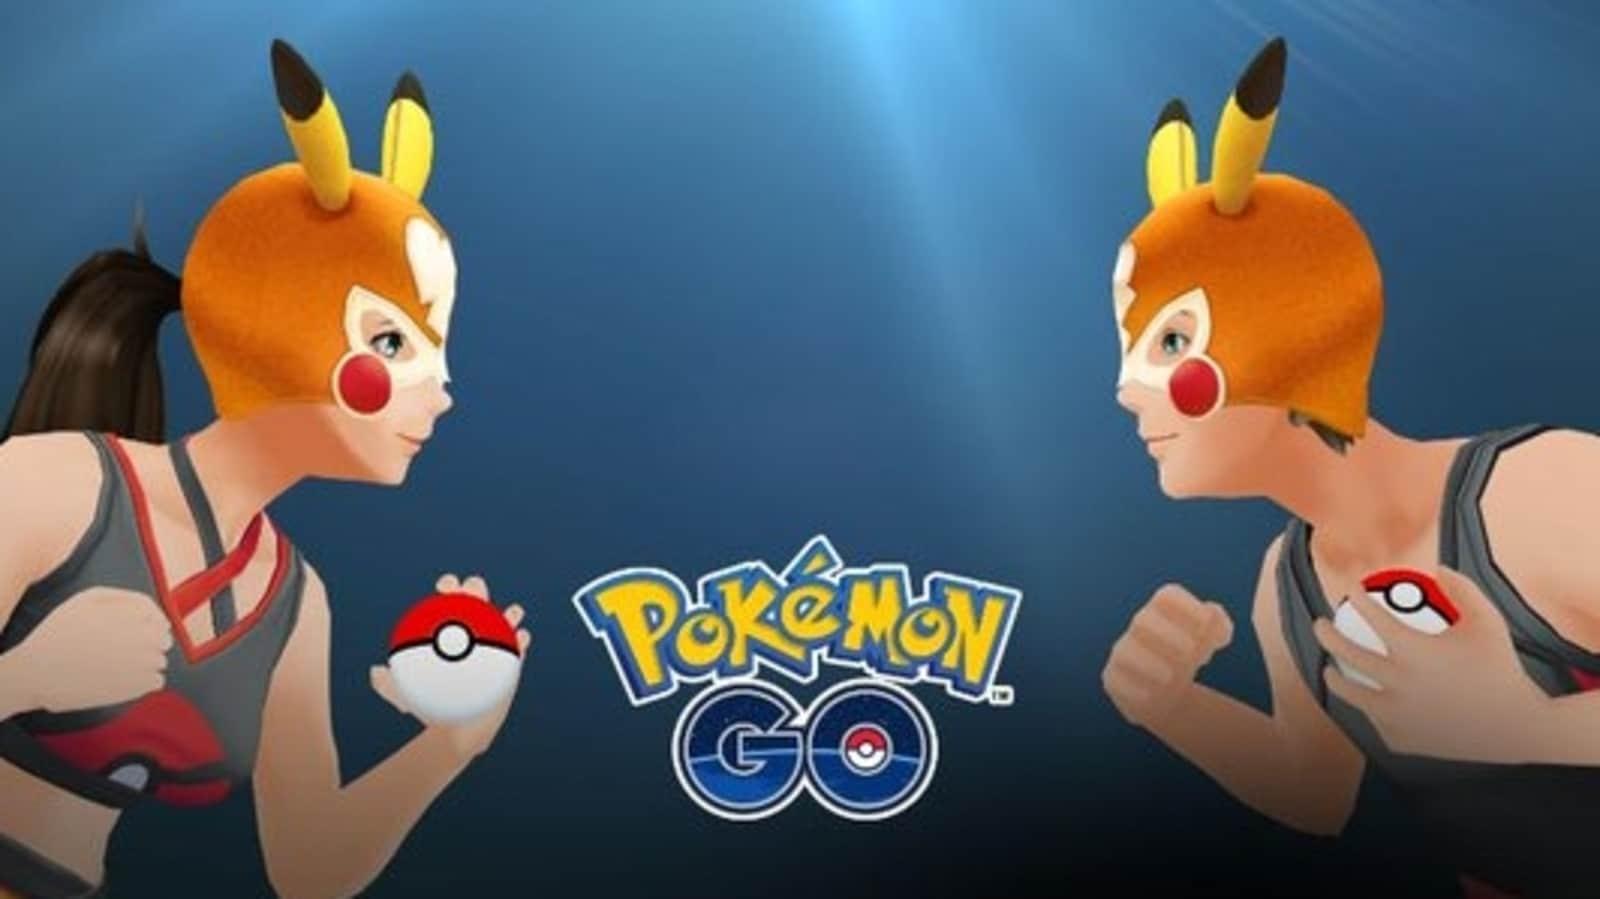 Pokemon Go: How to Catch Idem in June 2021